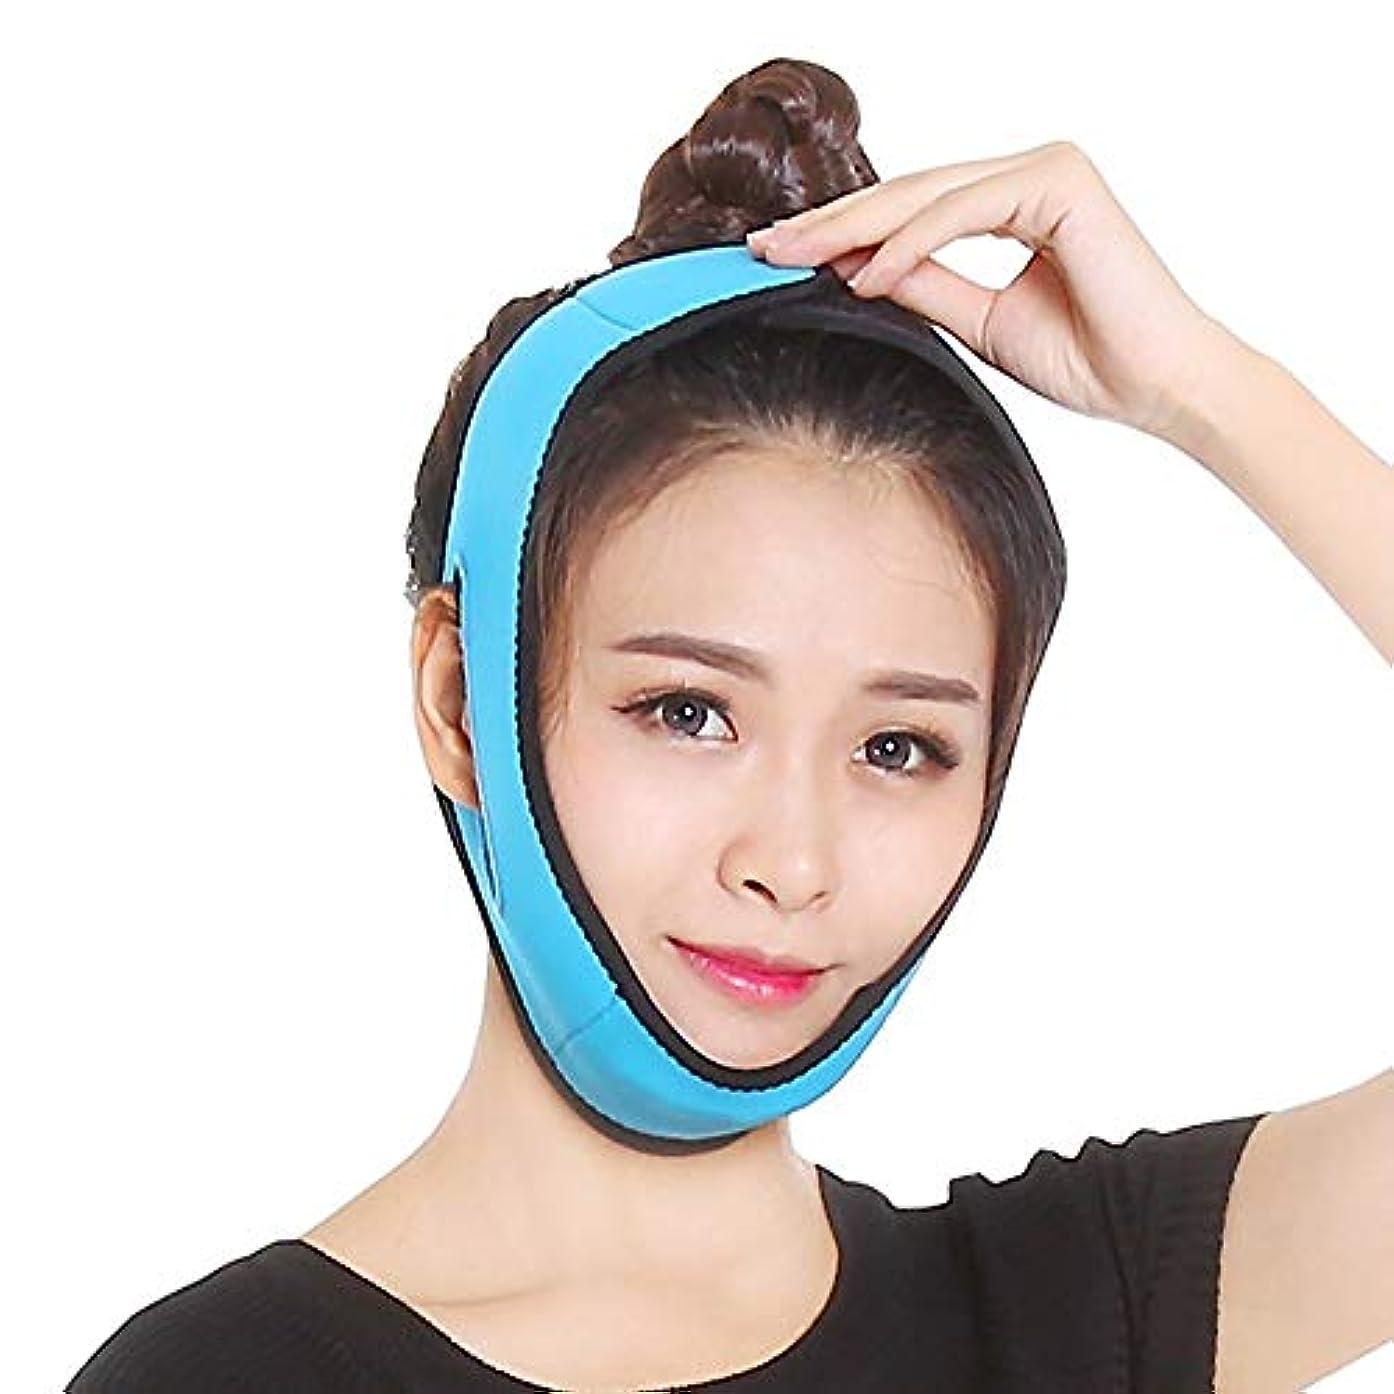 XINGZHE フェイシャルリフティングスリミングベルト - 薄いフェイス包帯二重あごデバイス無料フェイシャルマッサージ整形マスクを引き締める顔と首の顔スリム フェイスリフティングベルト